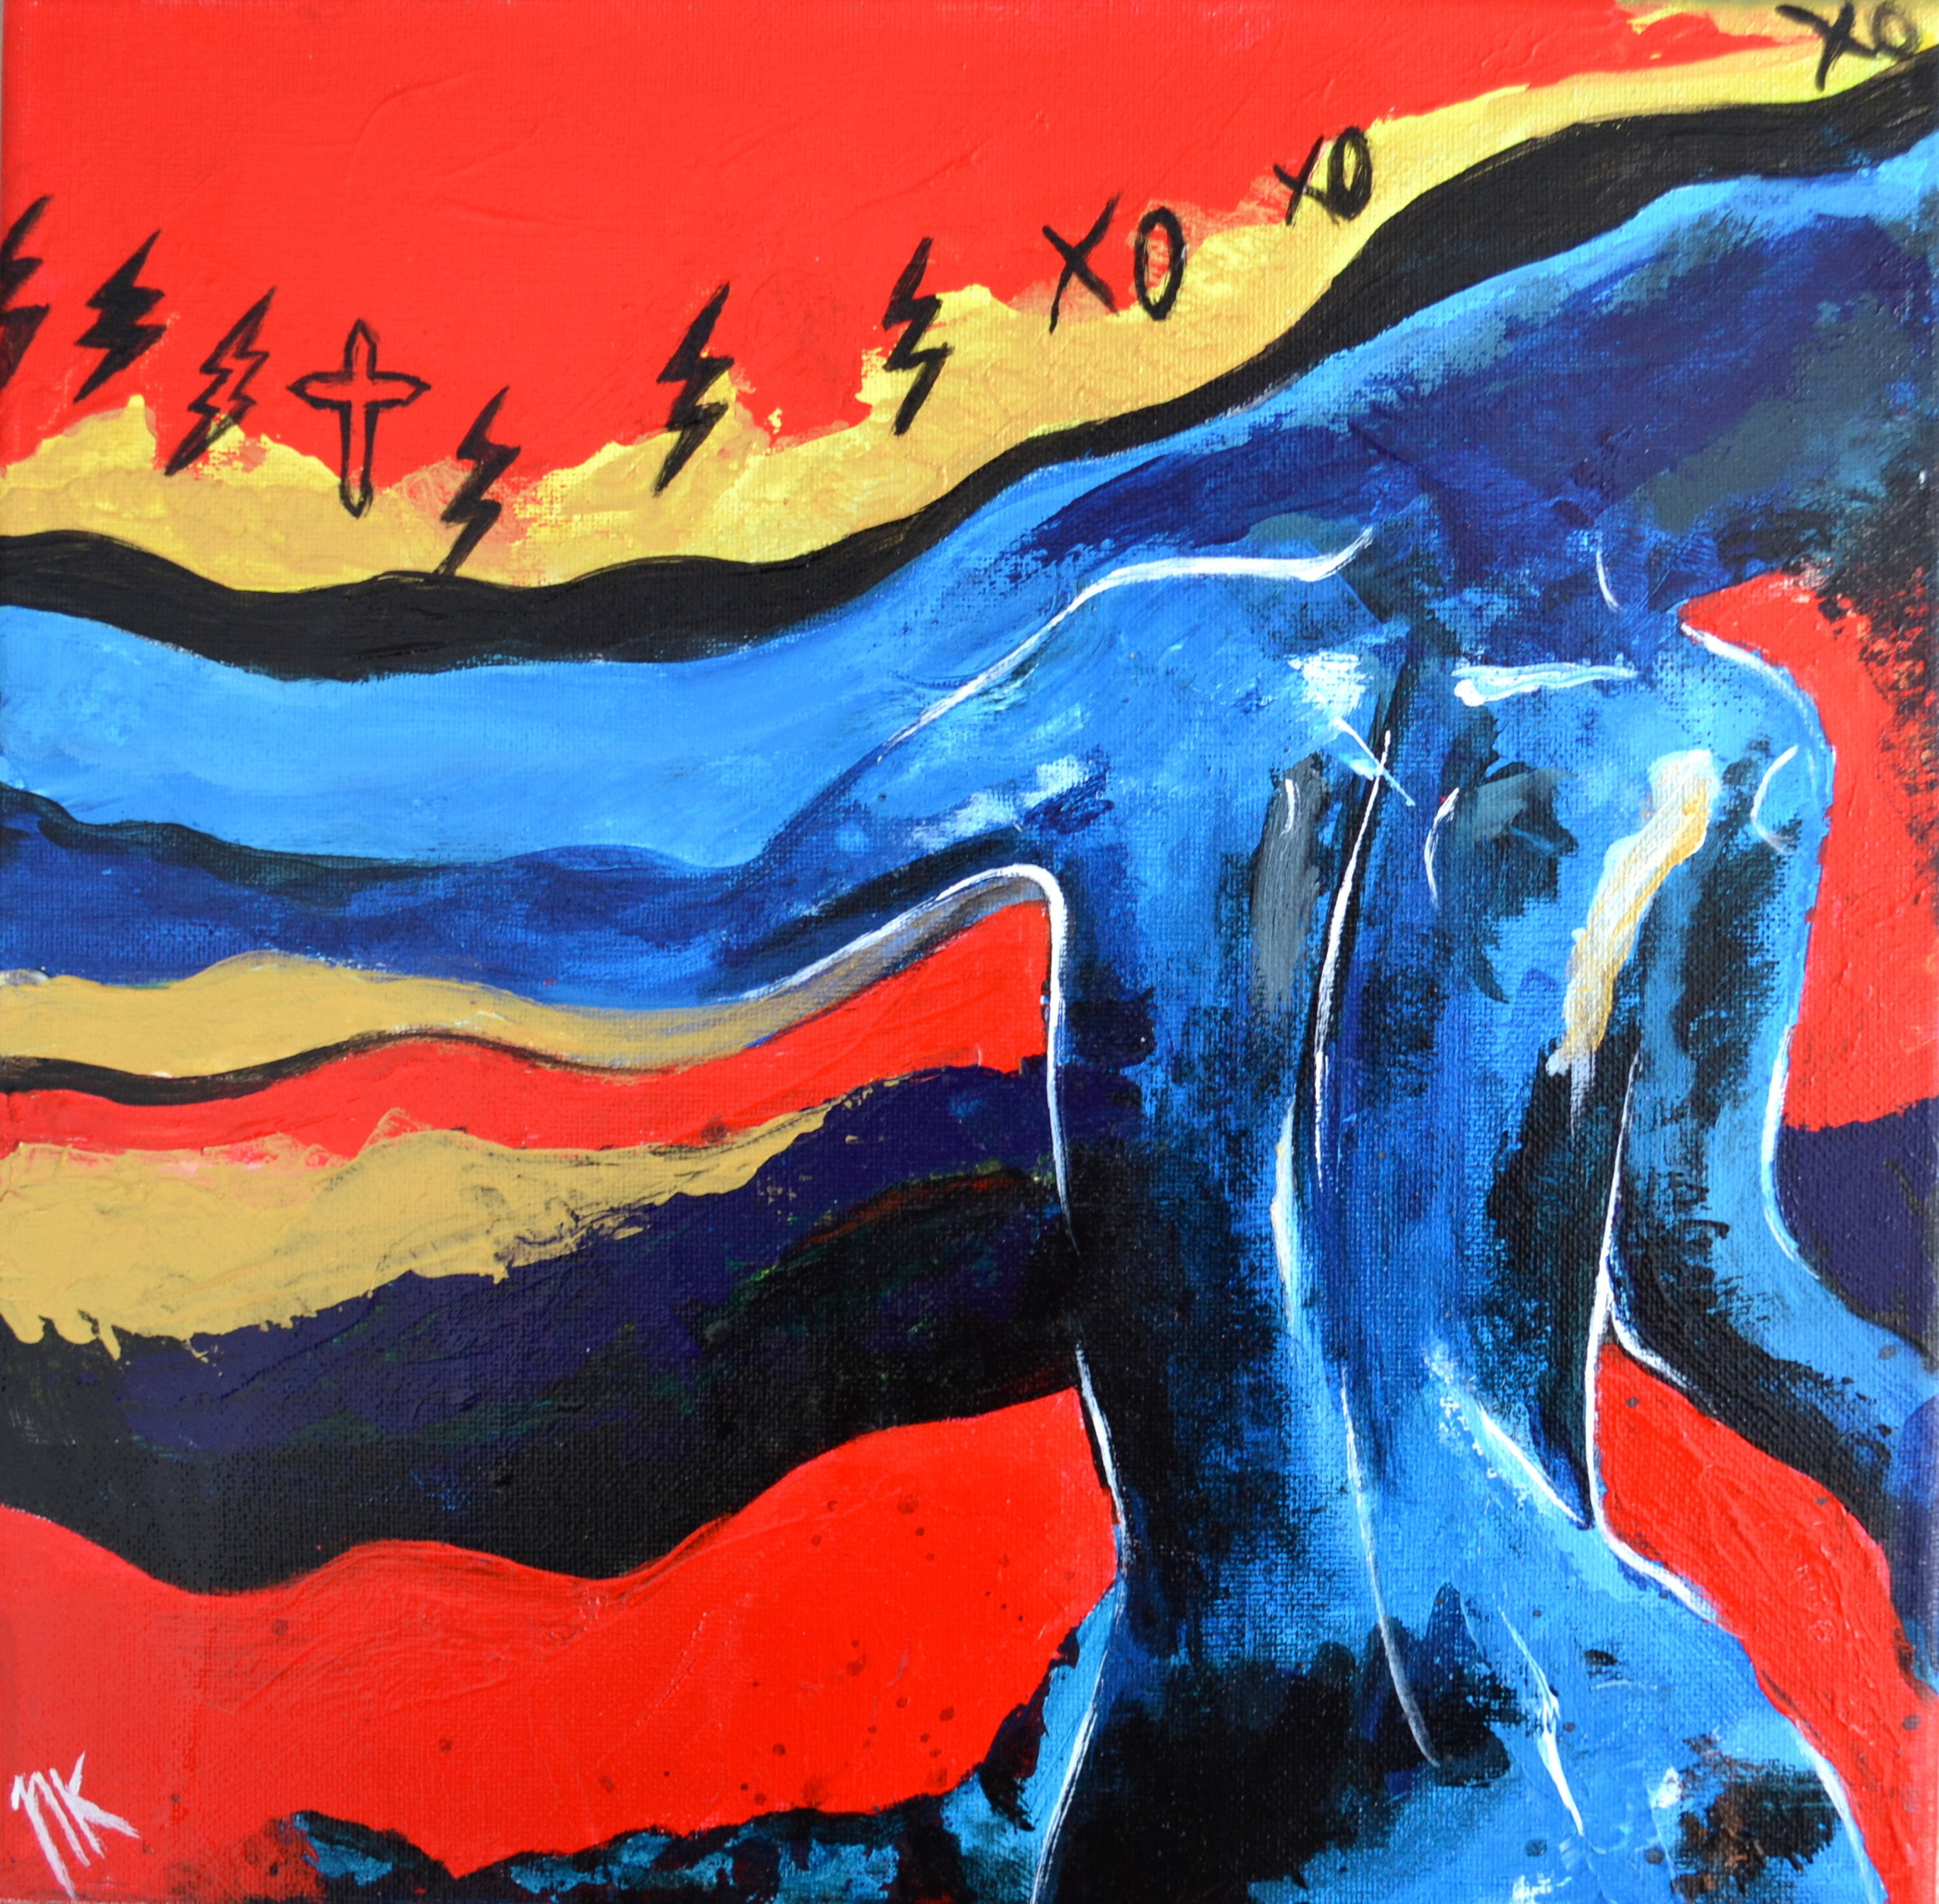 """STARGIRL""  12"" x 12"" Acrylic on Canvas"